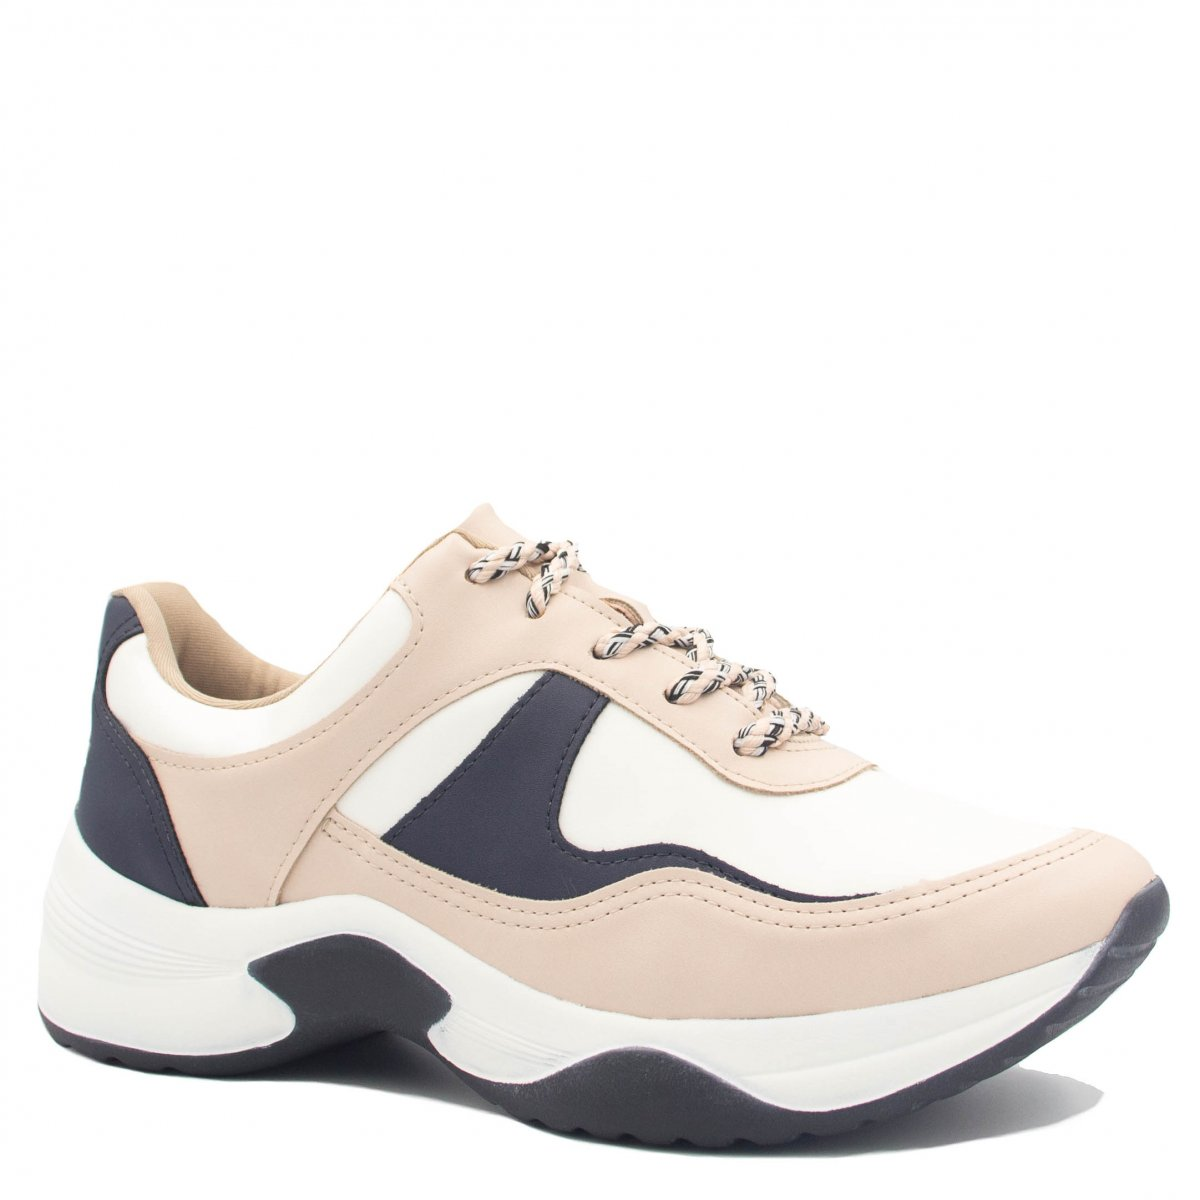 c6b2b7db9 Tênis Sneaker Dakota Chunky Recortes G0571   Betisa